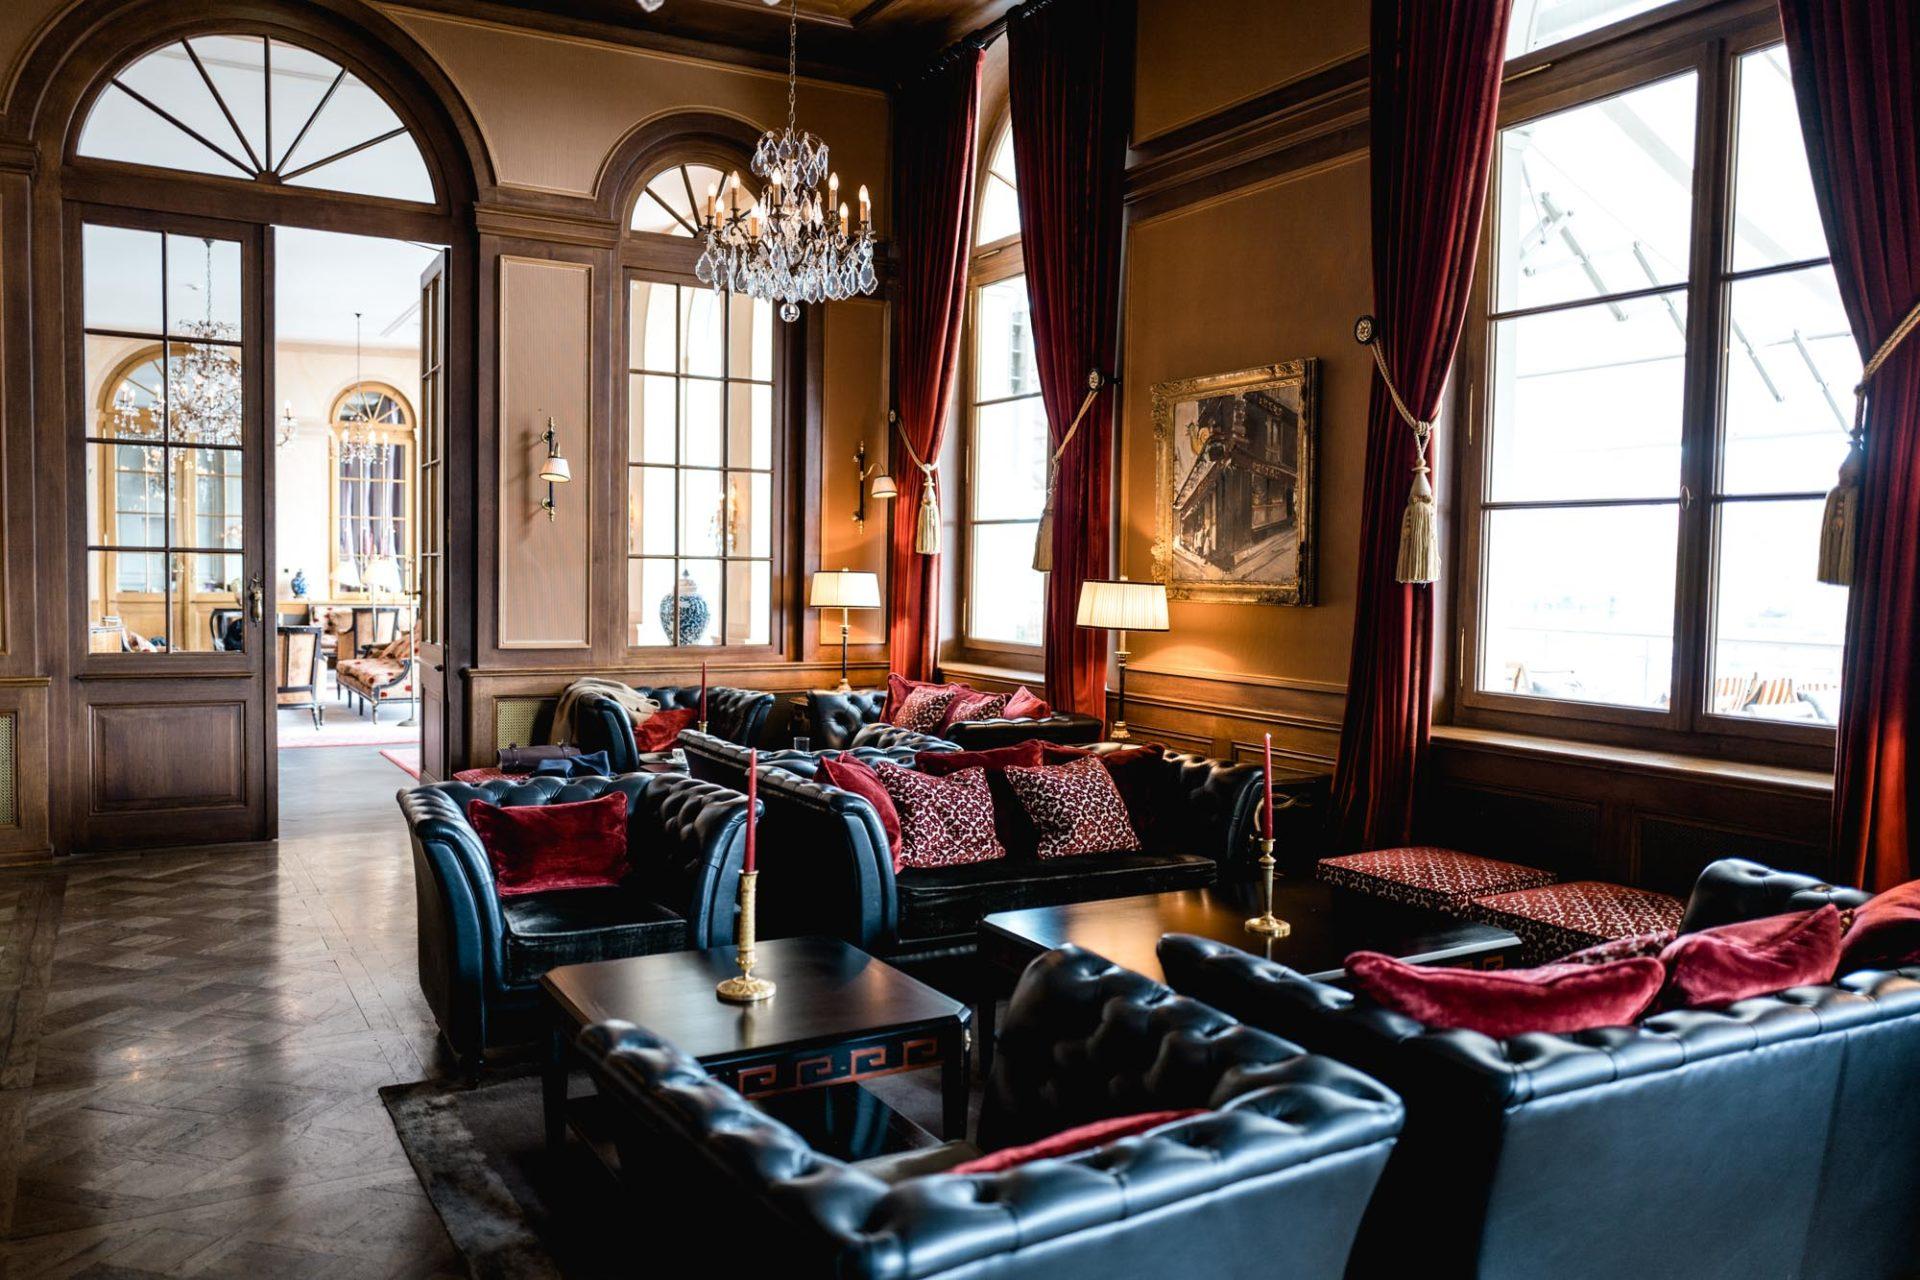 Grand Hotel des Trois Rois